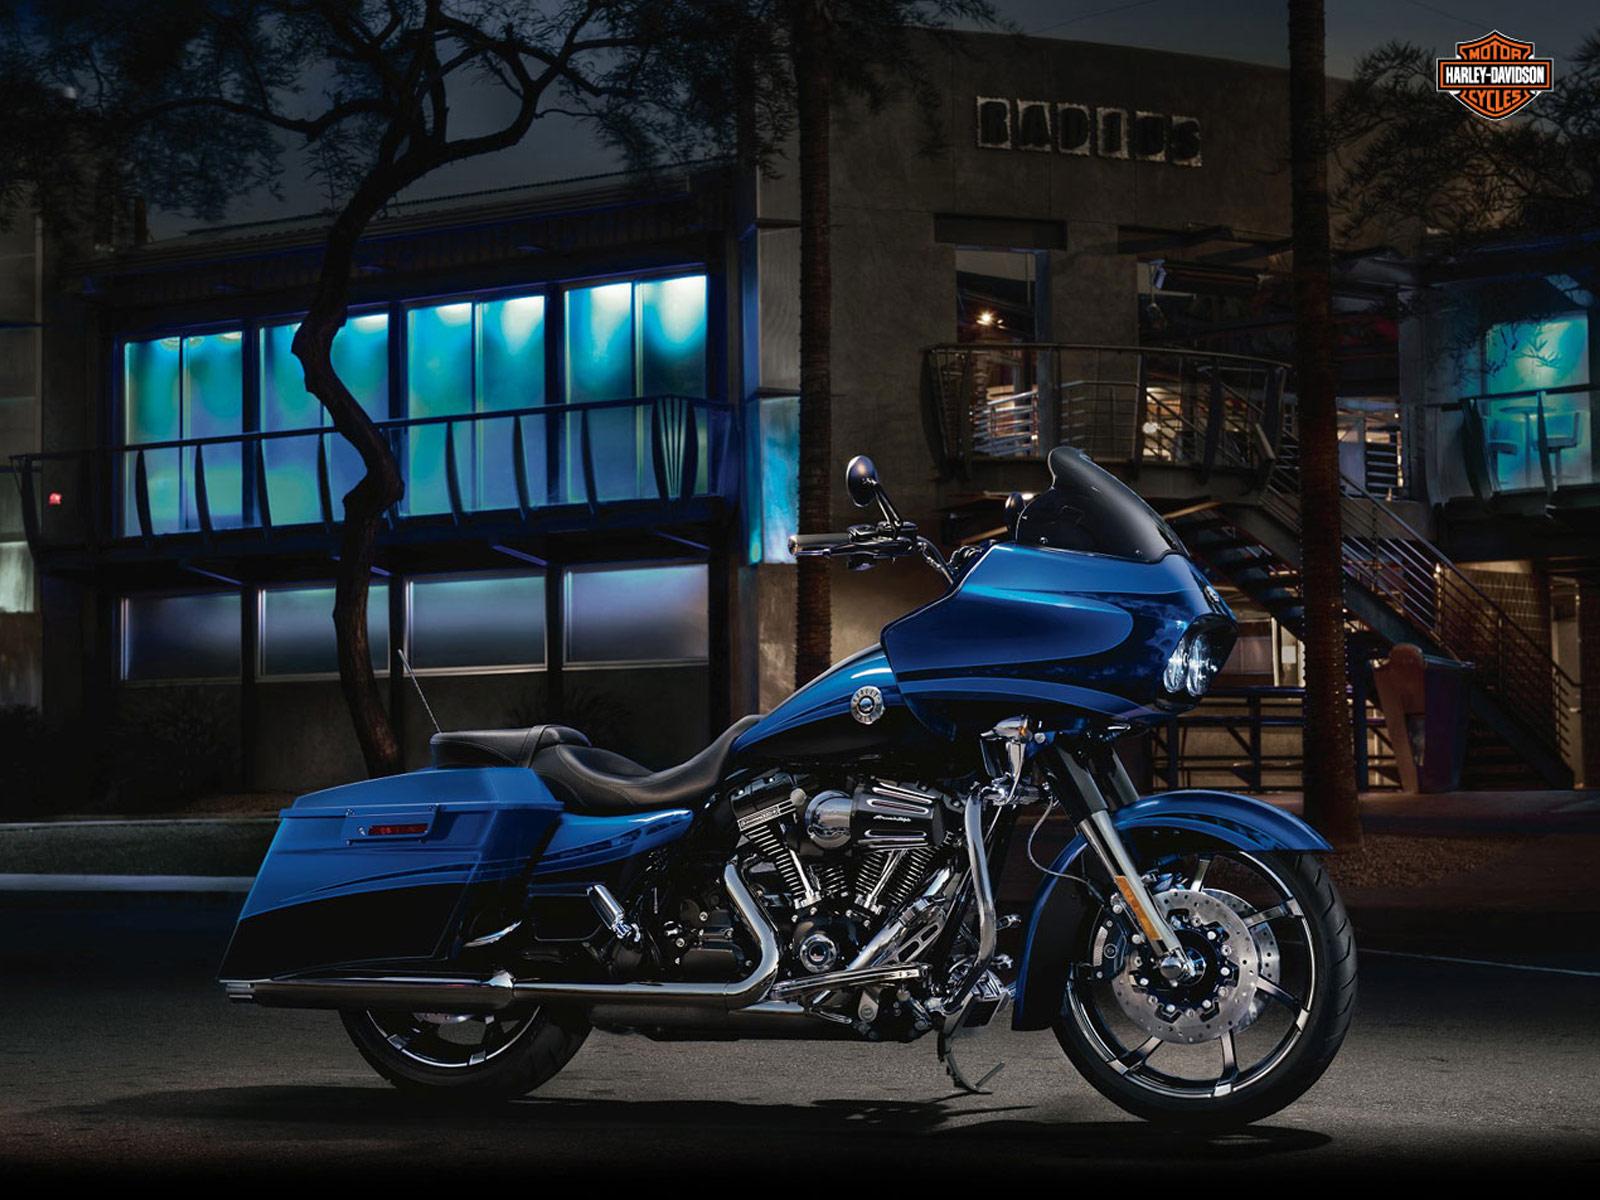 2015 Harley-Davidson Road Glide Custom